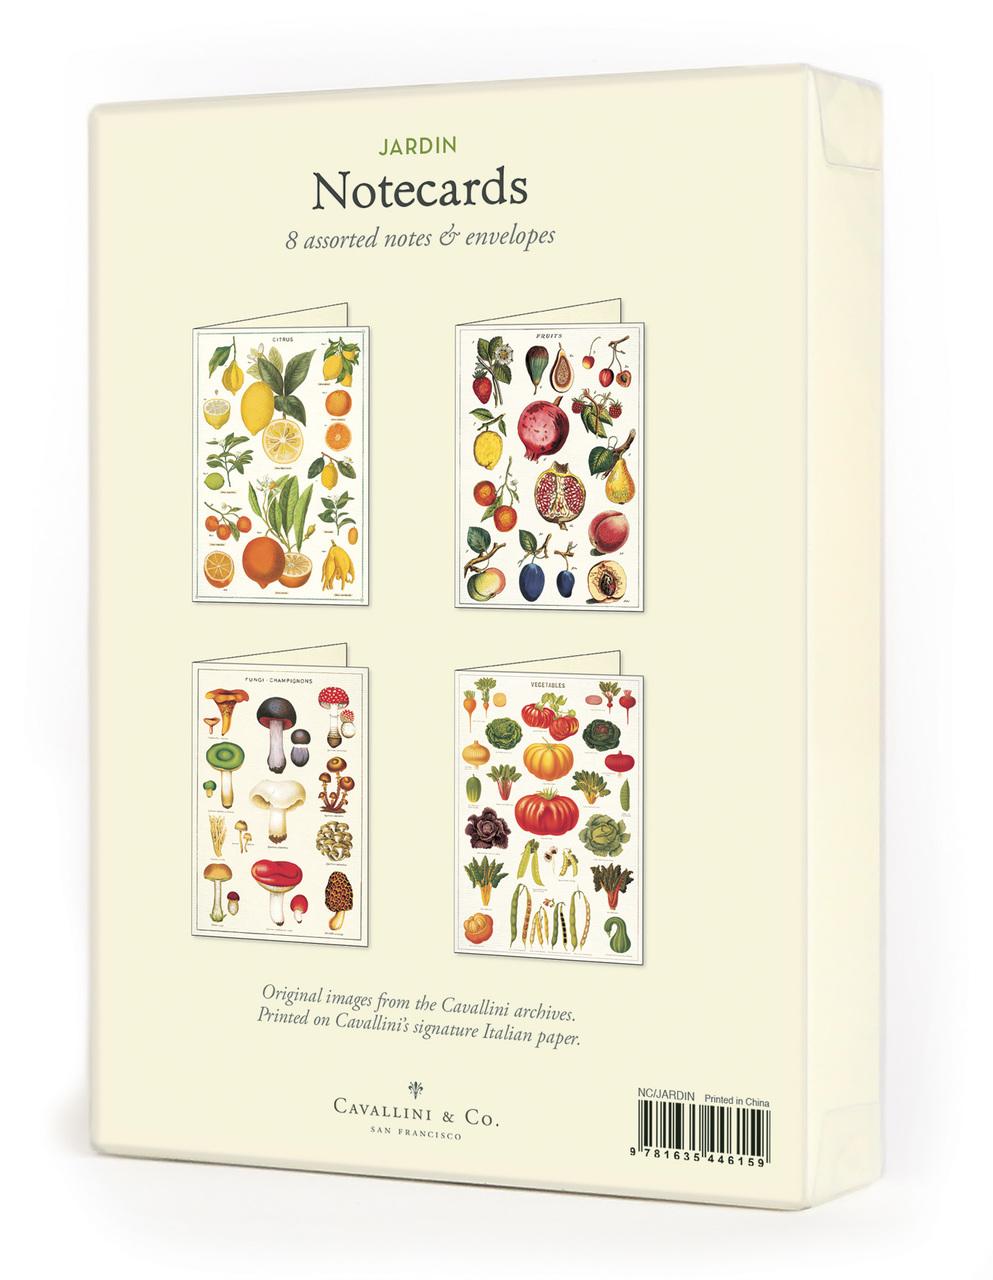 Jardin Boxed Notecards image 2